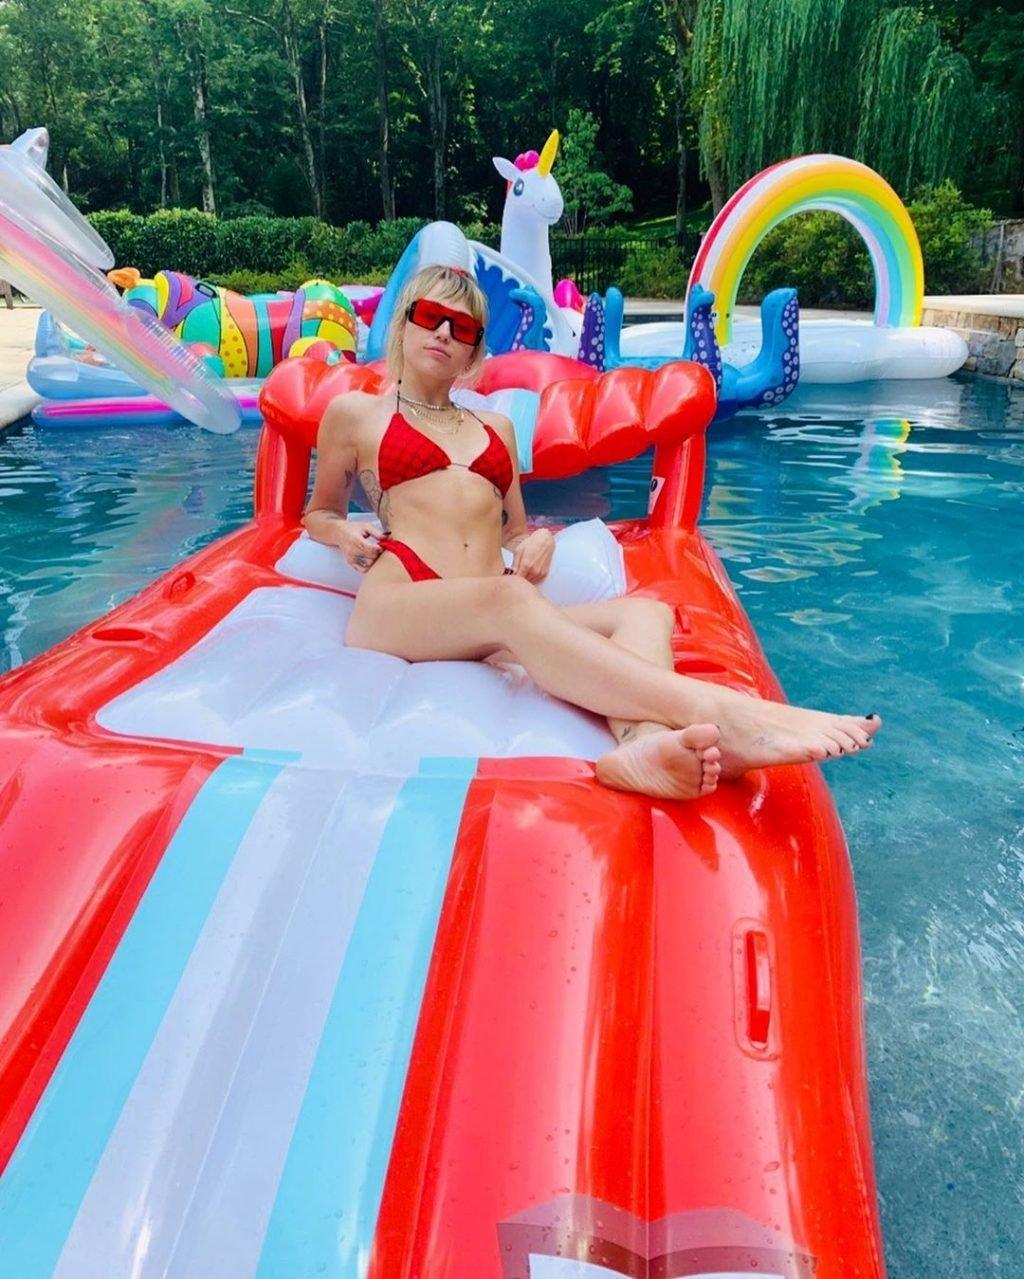 Miley Cyrus Sexy (3 Hot Pics)